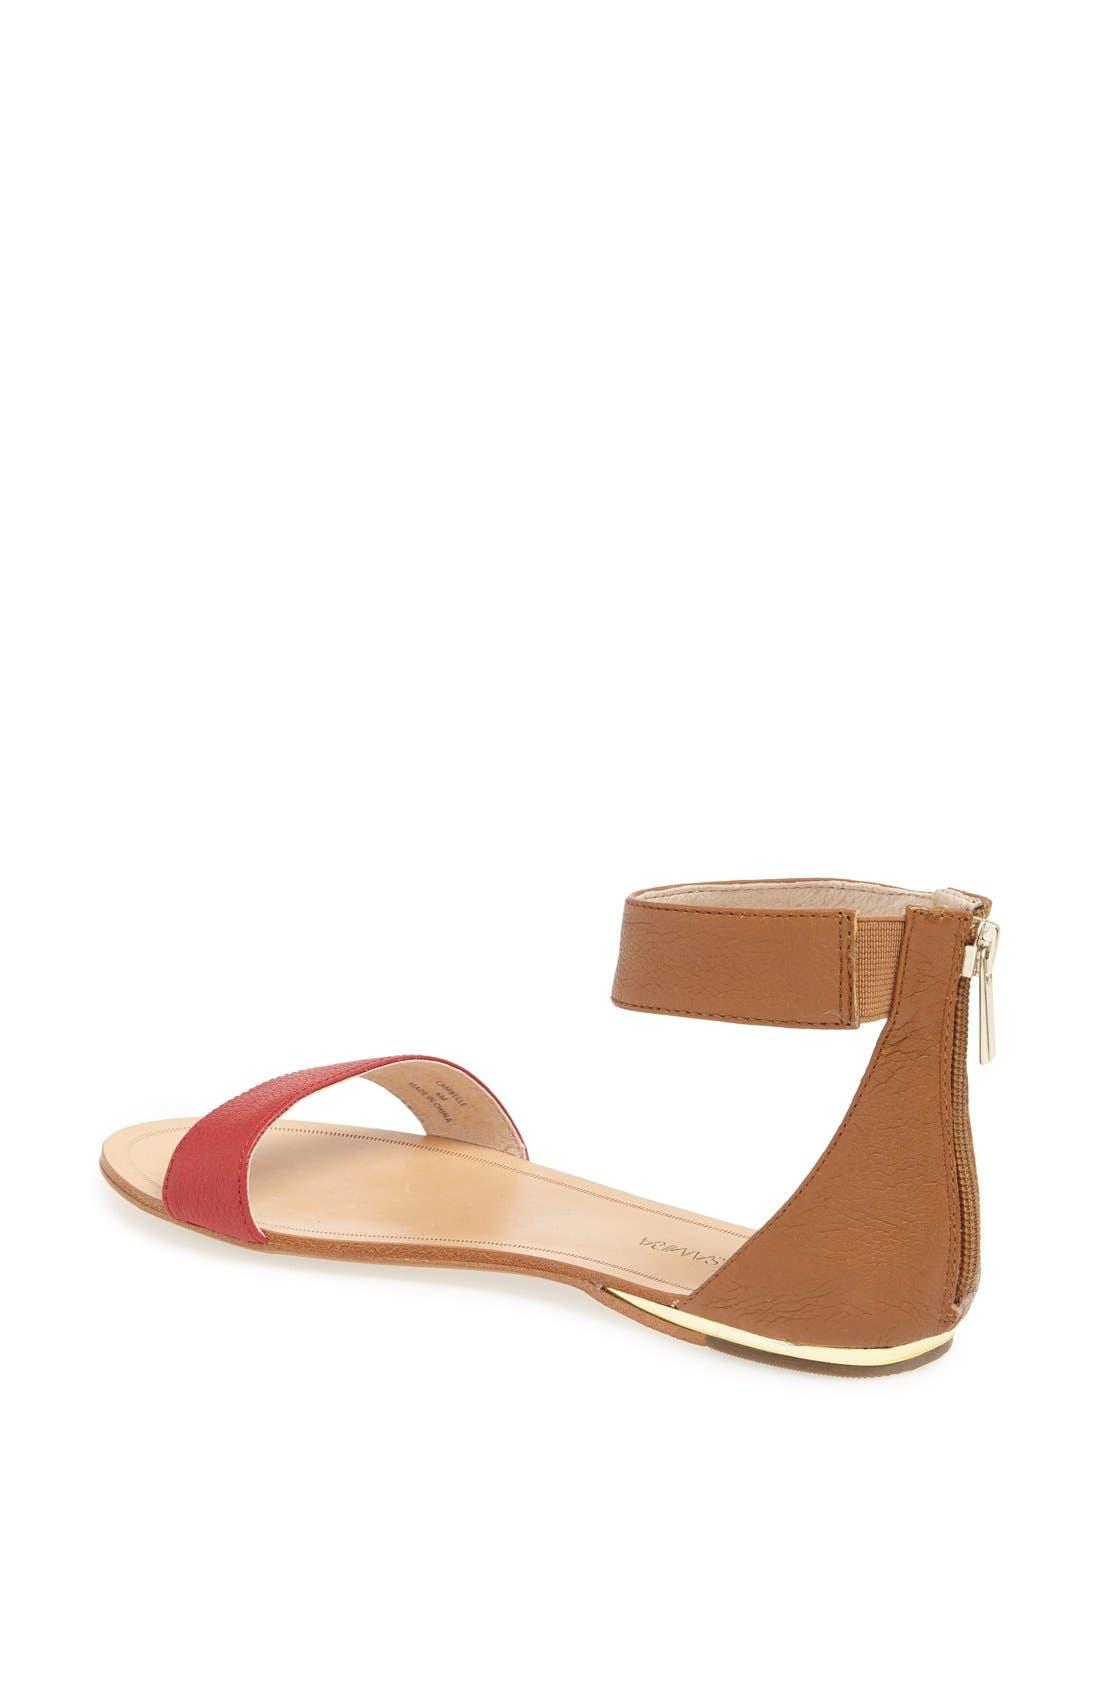 ,                             'Cambelle' Ankle Strap Sandal,                             Alternate thumbnail 32, color,                             210